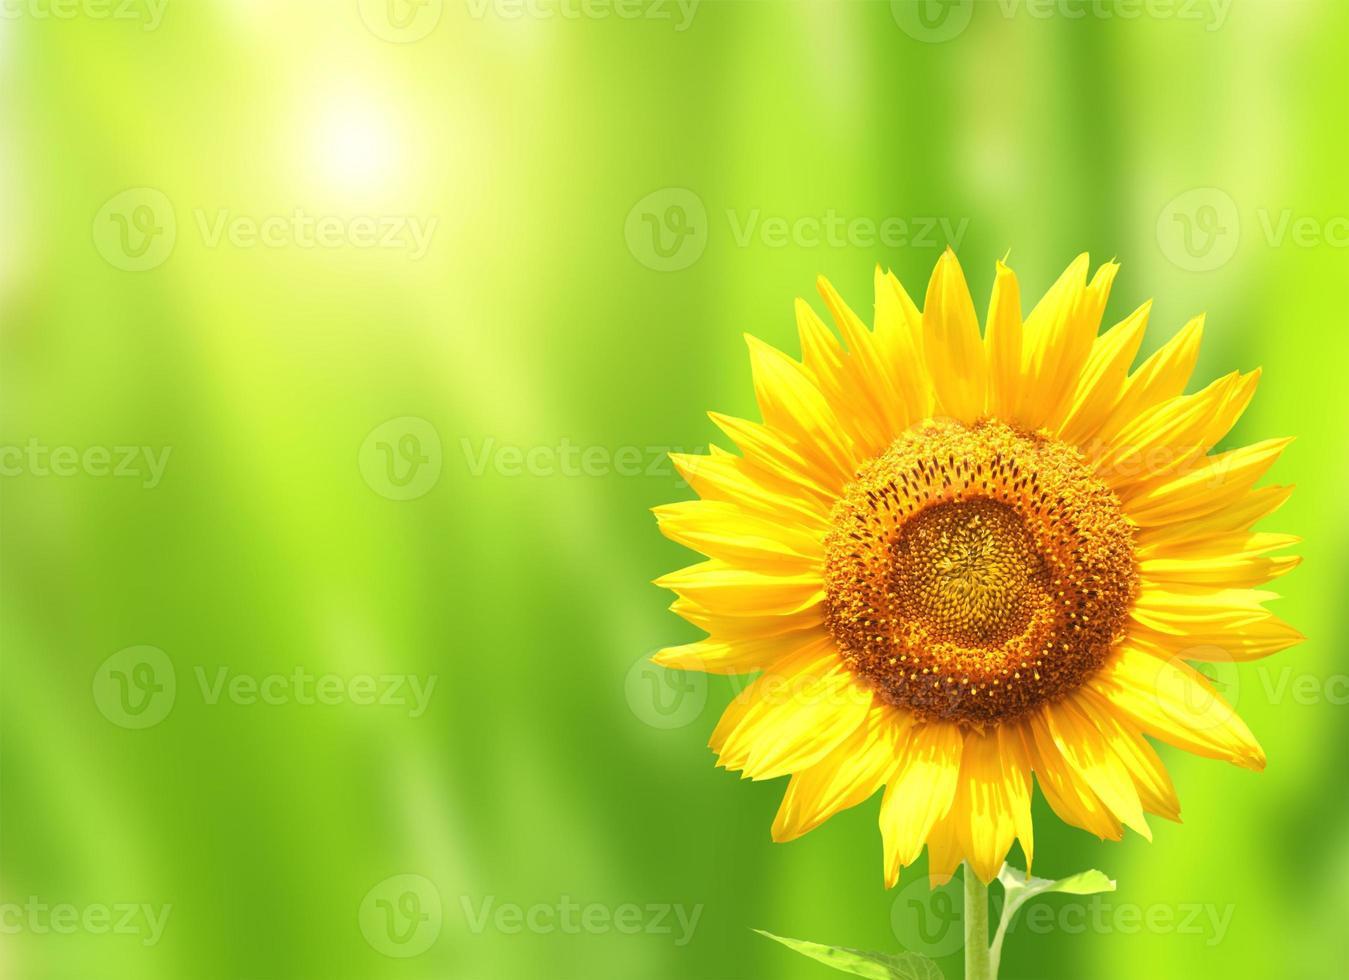 Bright yellow sunflower on green background photo